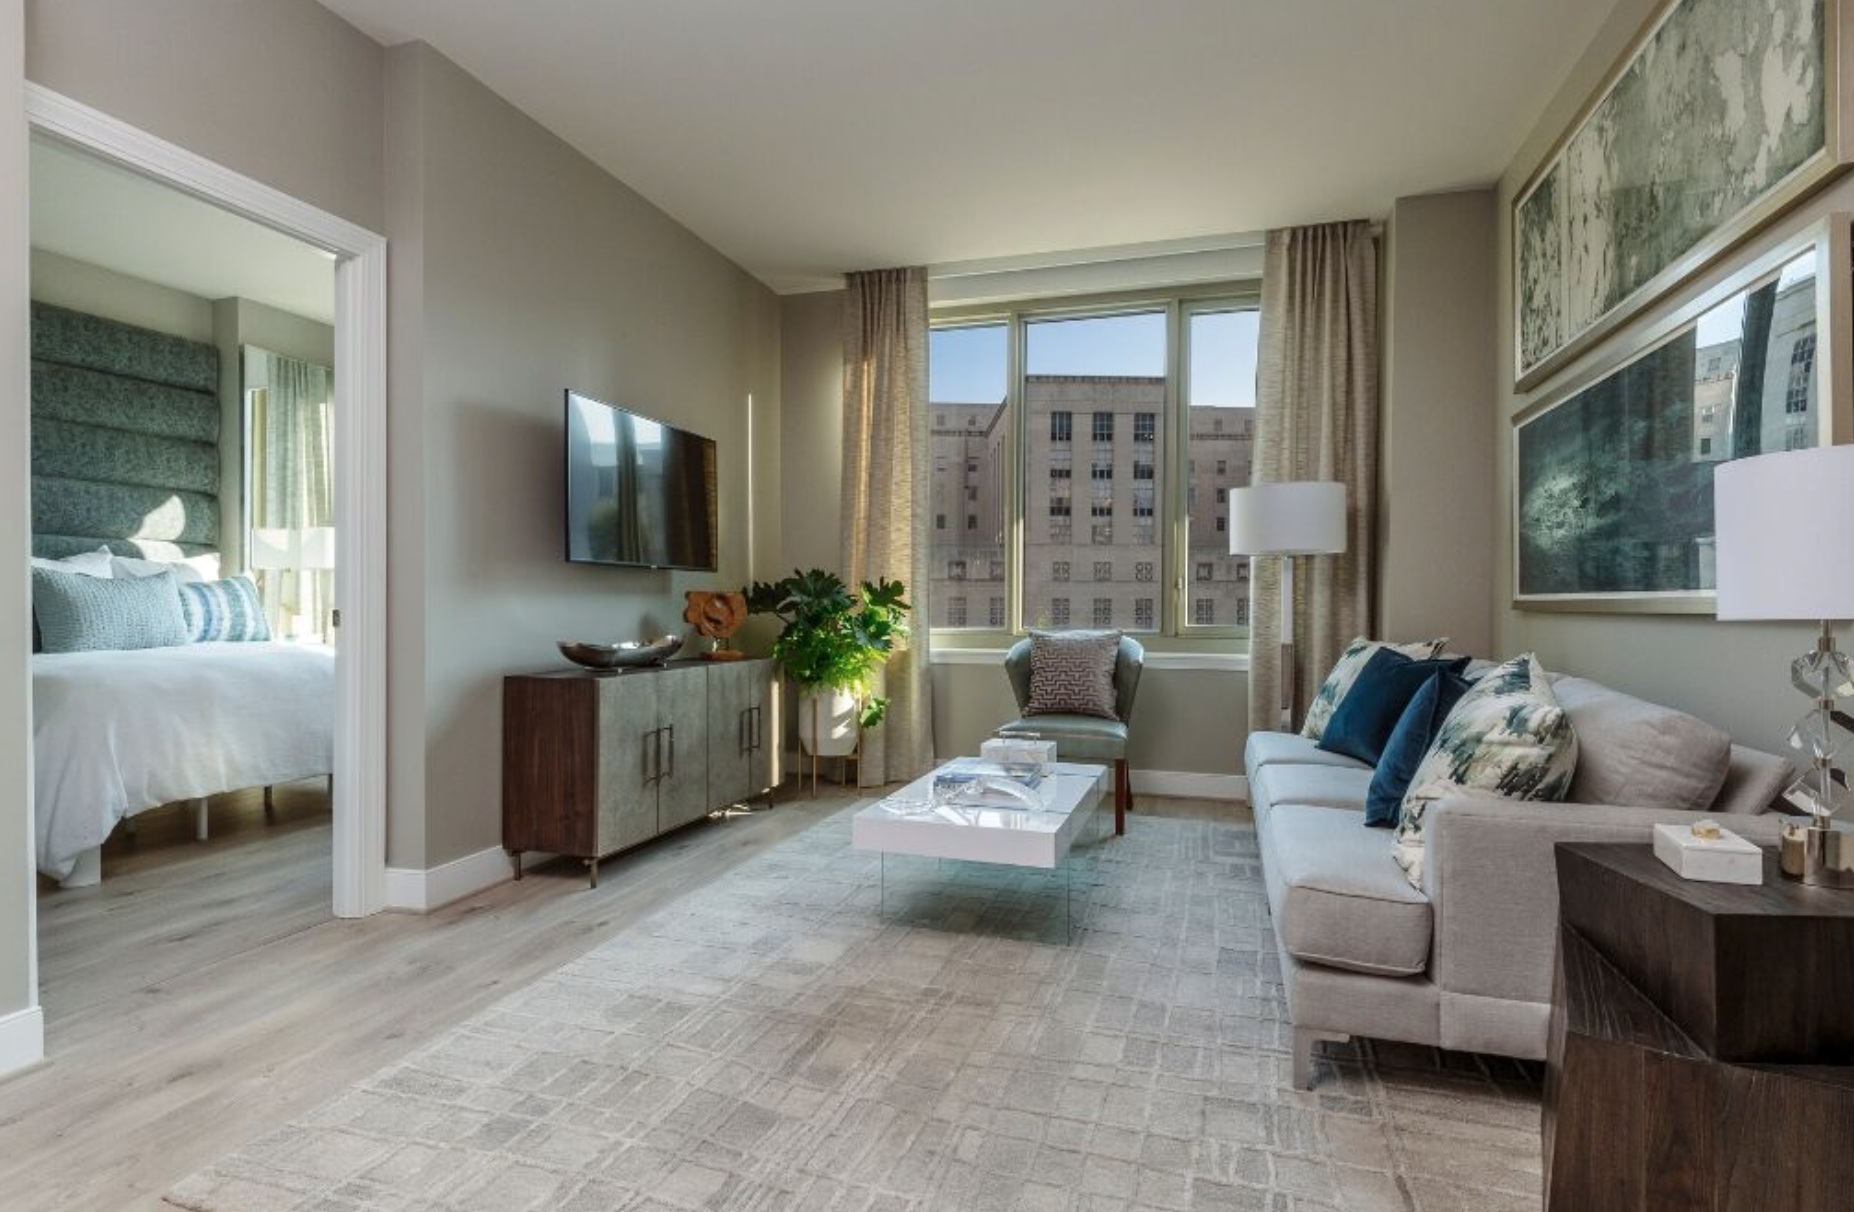 1331 Apartments in Washington, DC | Interim Homes